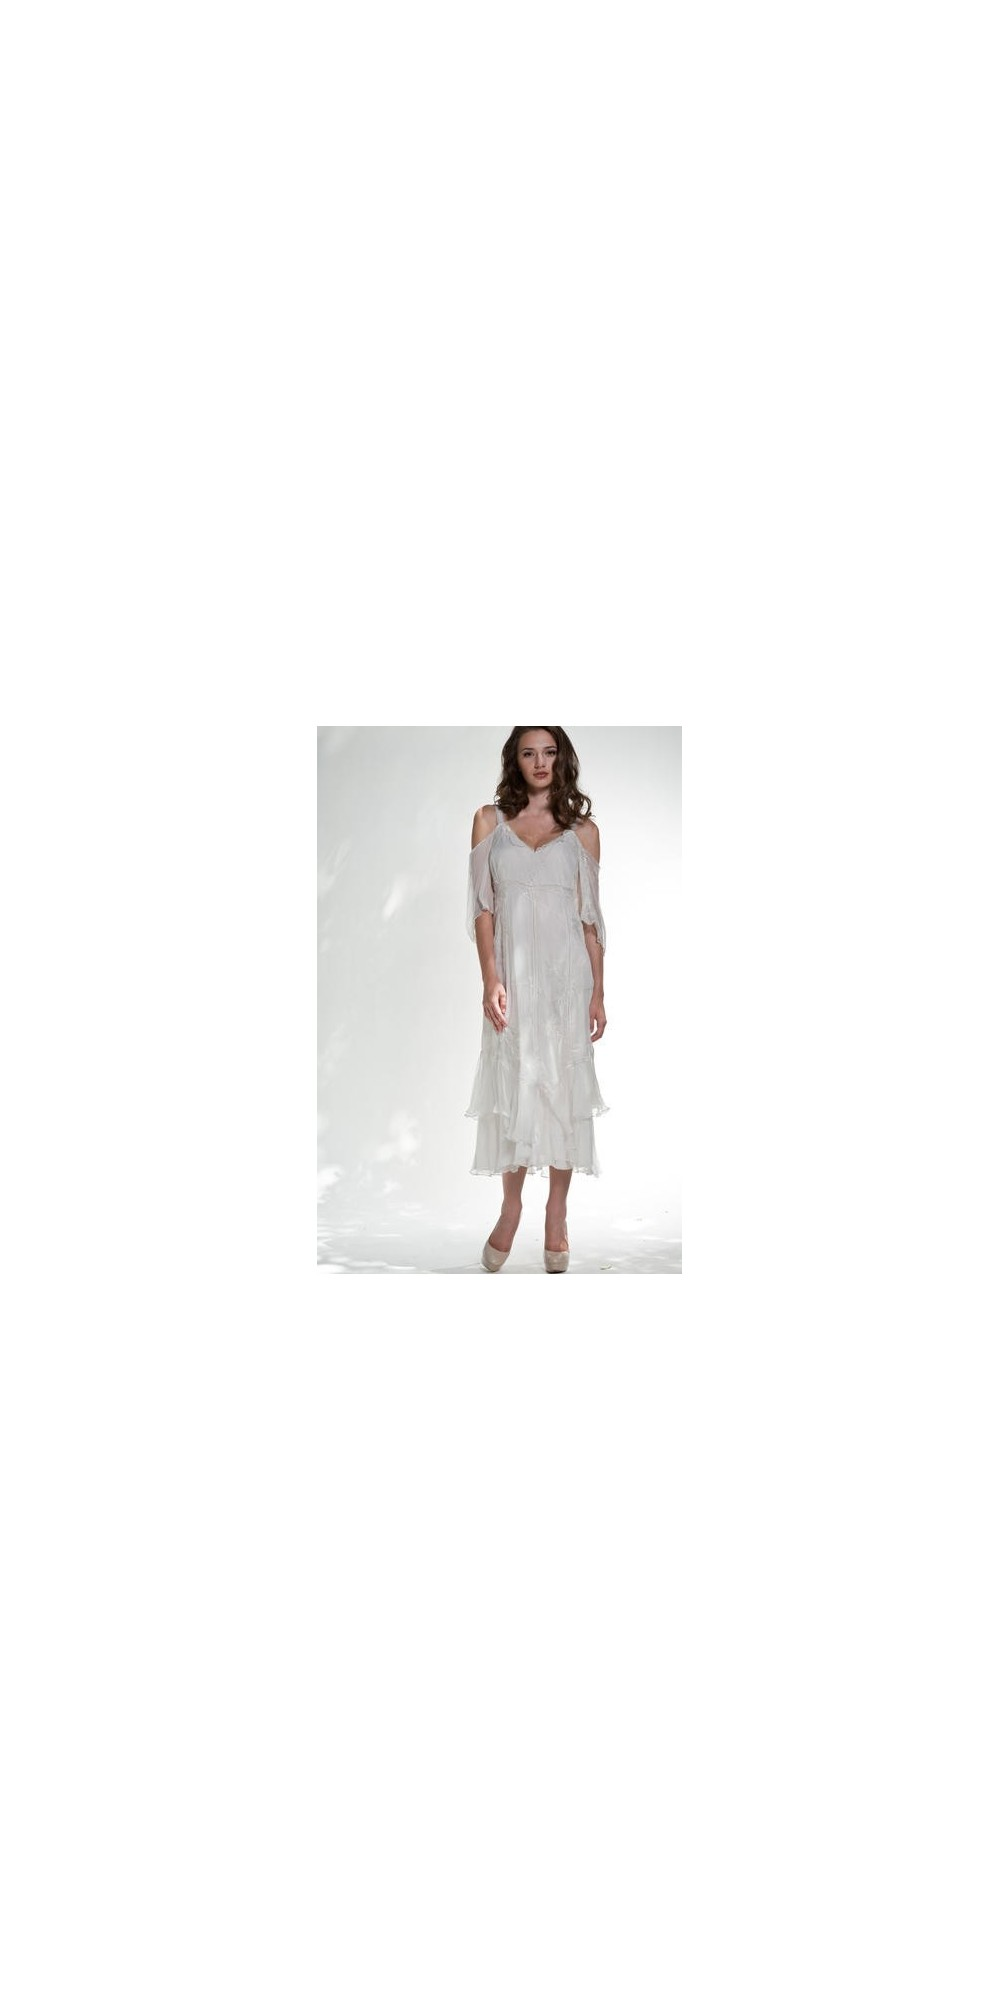 Nataya 40061 1920s Wedding Dress - SOLD OUT